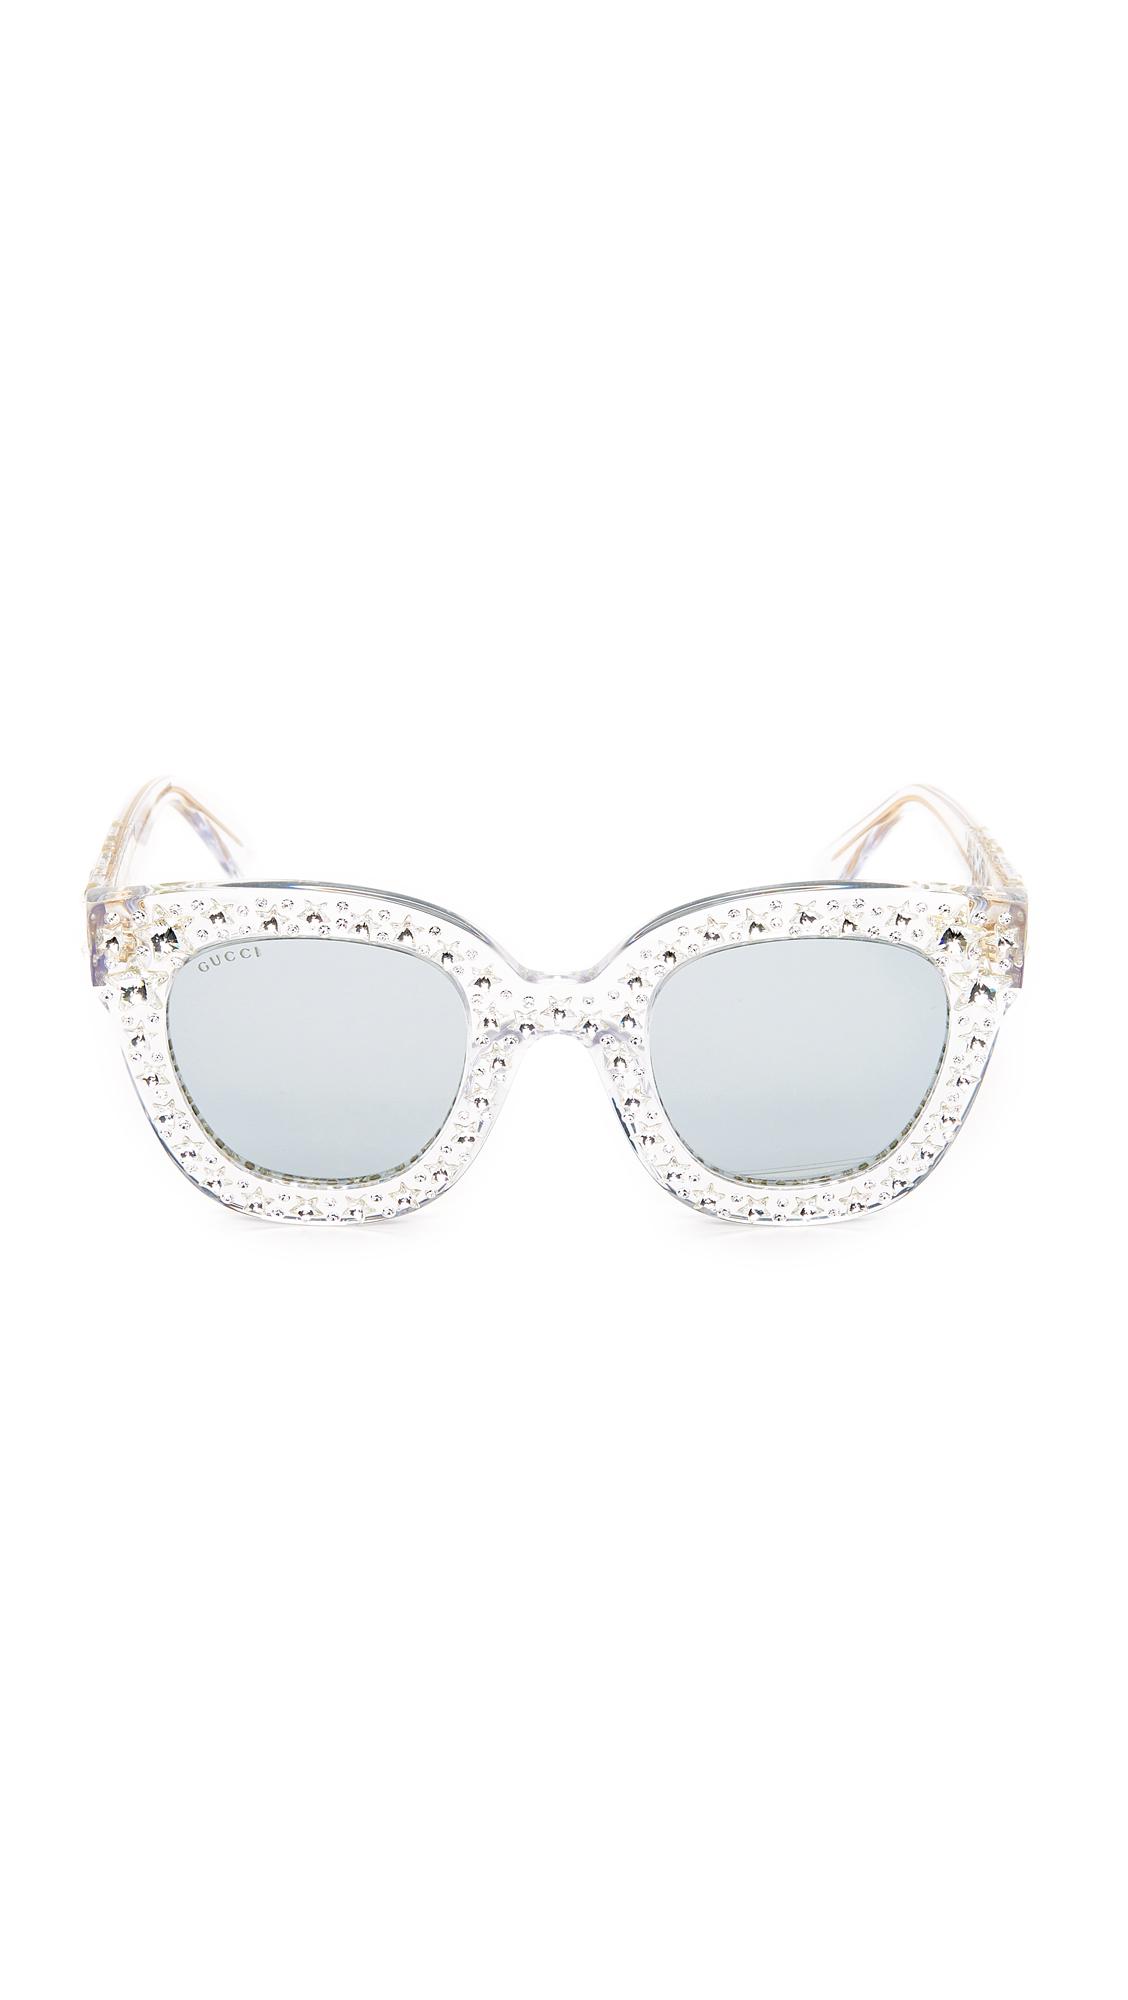 7fc8d07daa Gucci Swarovski Crystal Square Sunglasses